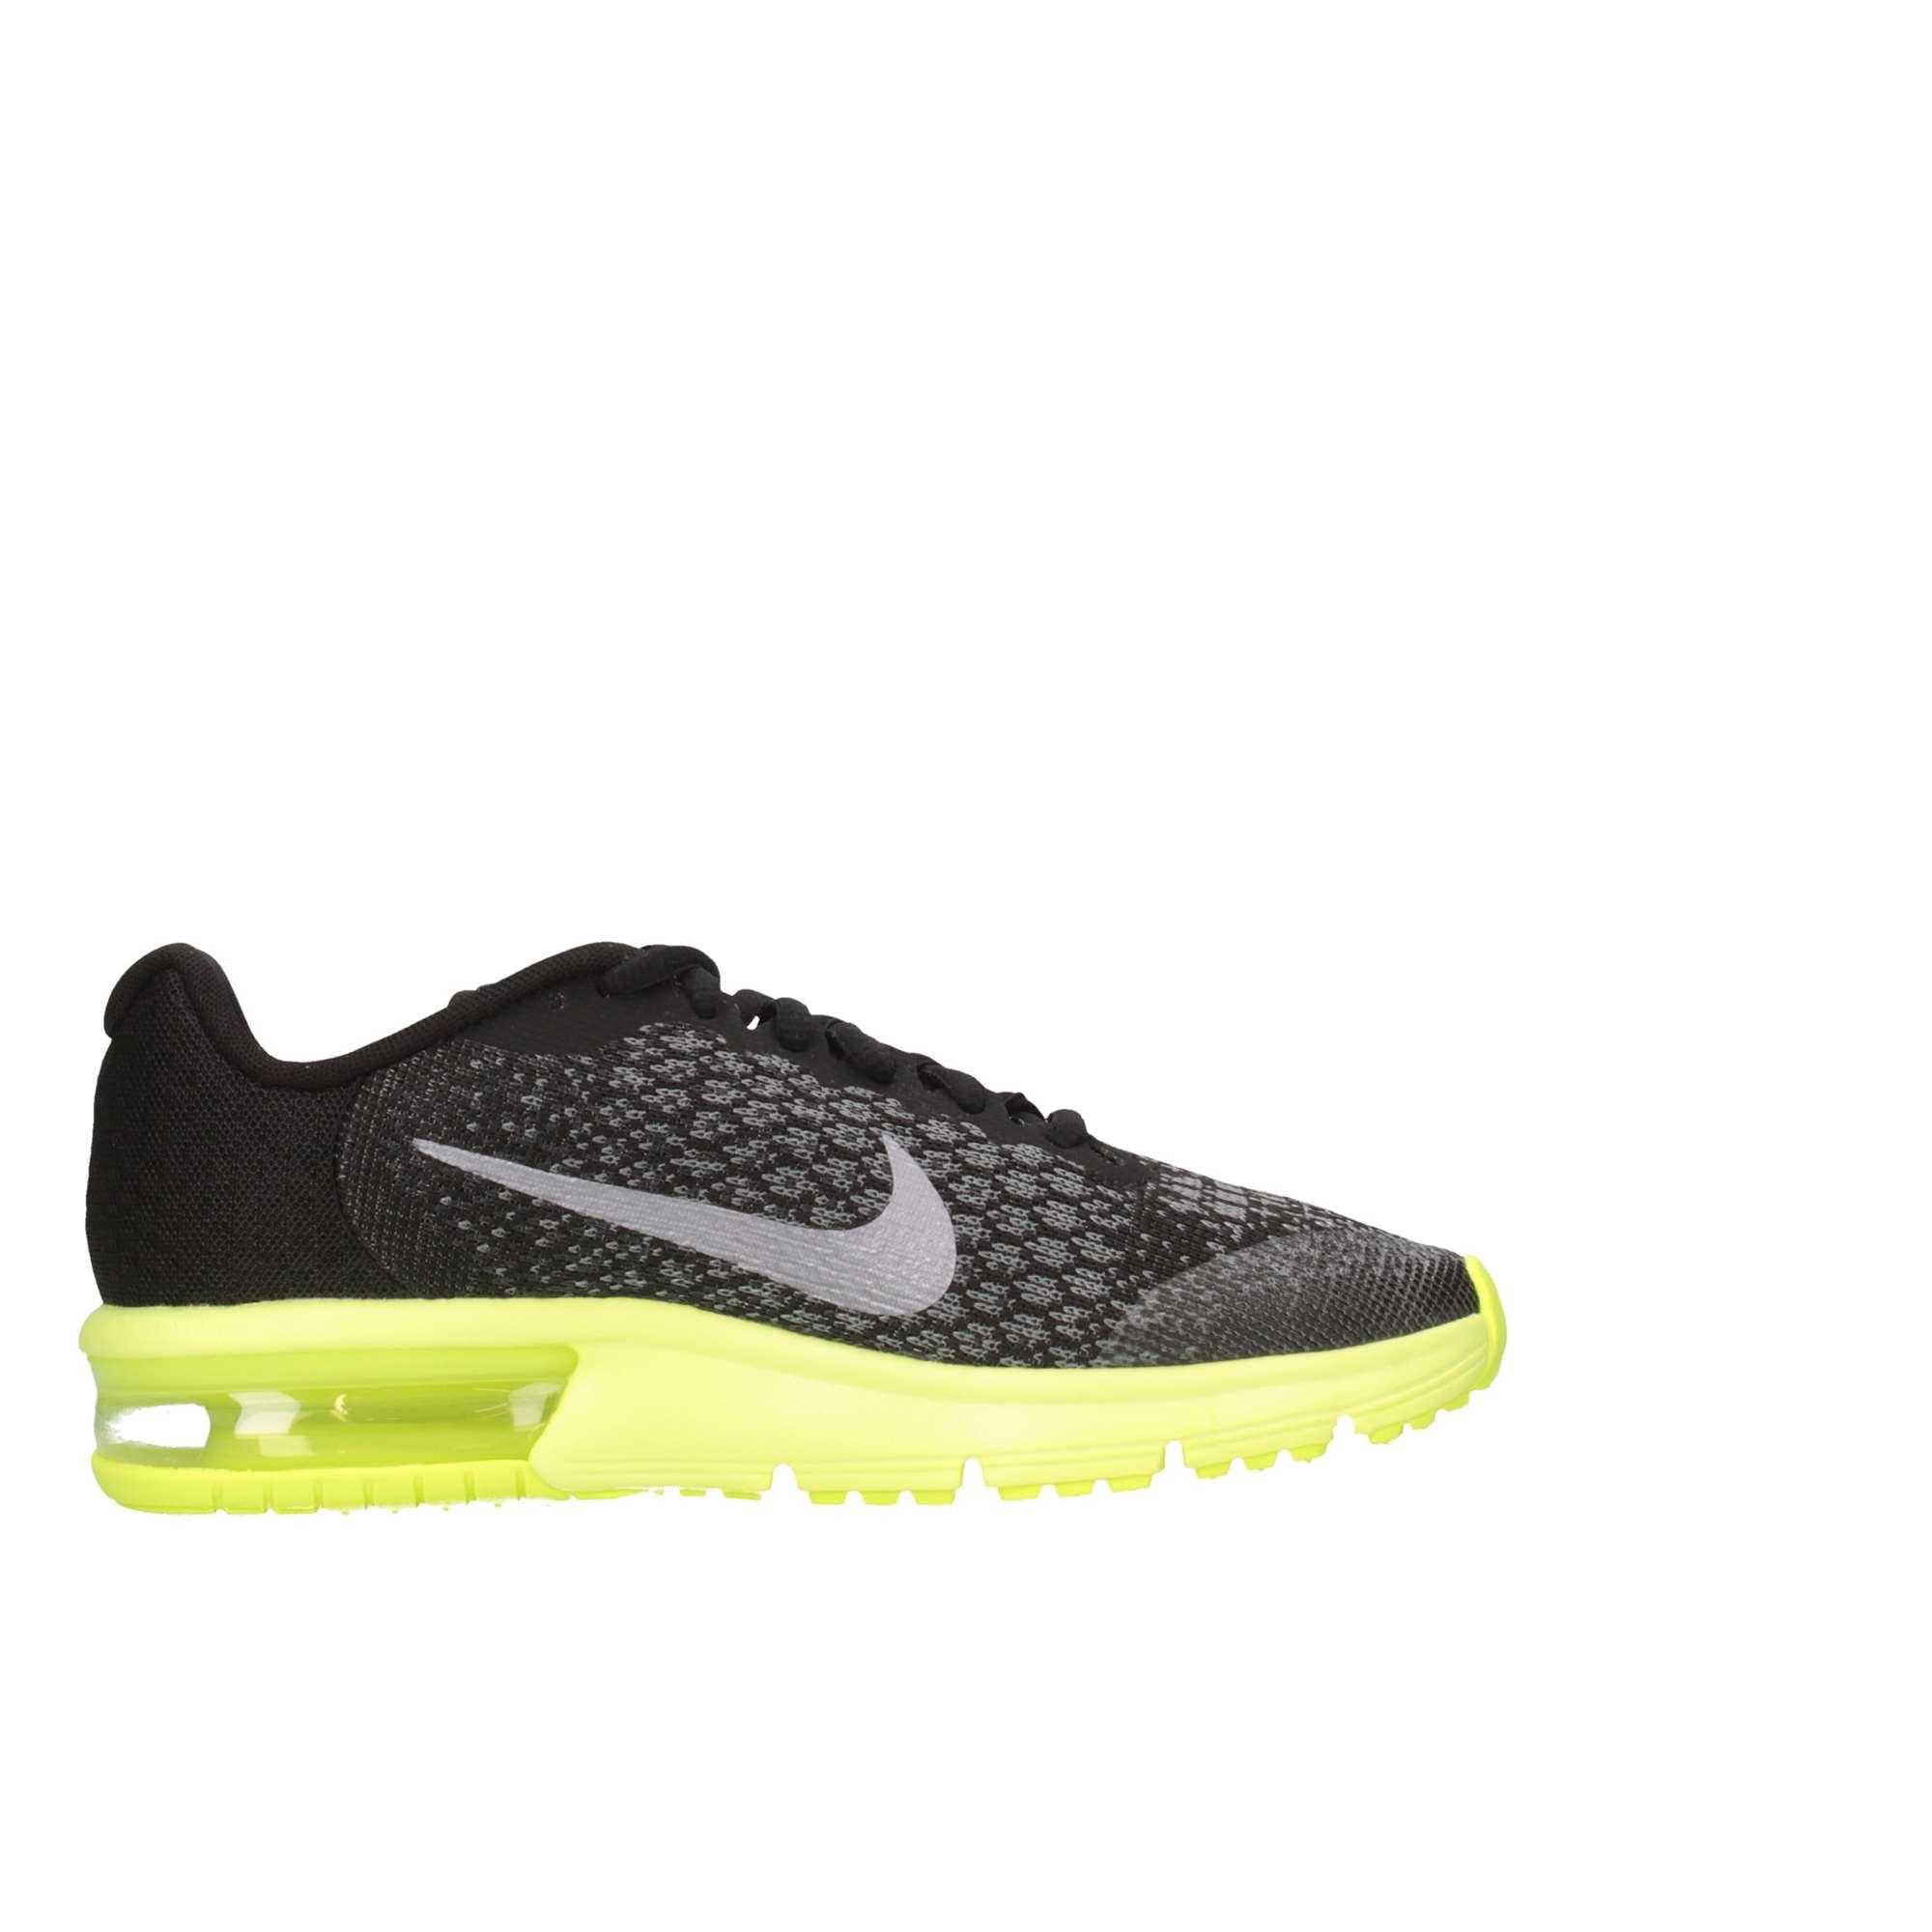 Sneakers-Bambino-Nike-NIK869993-008-Autunno-Inverno